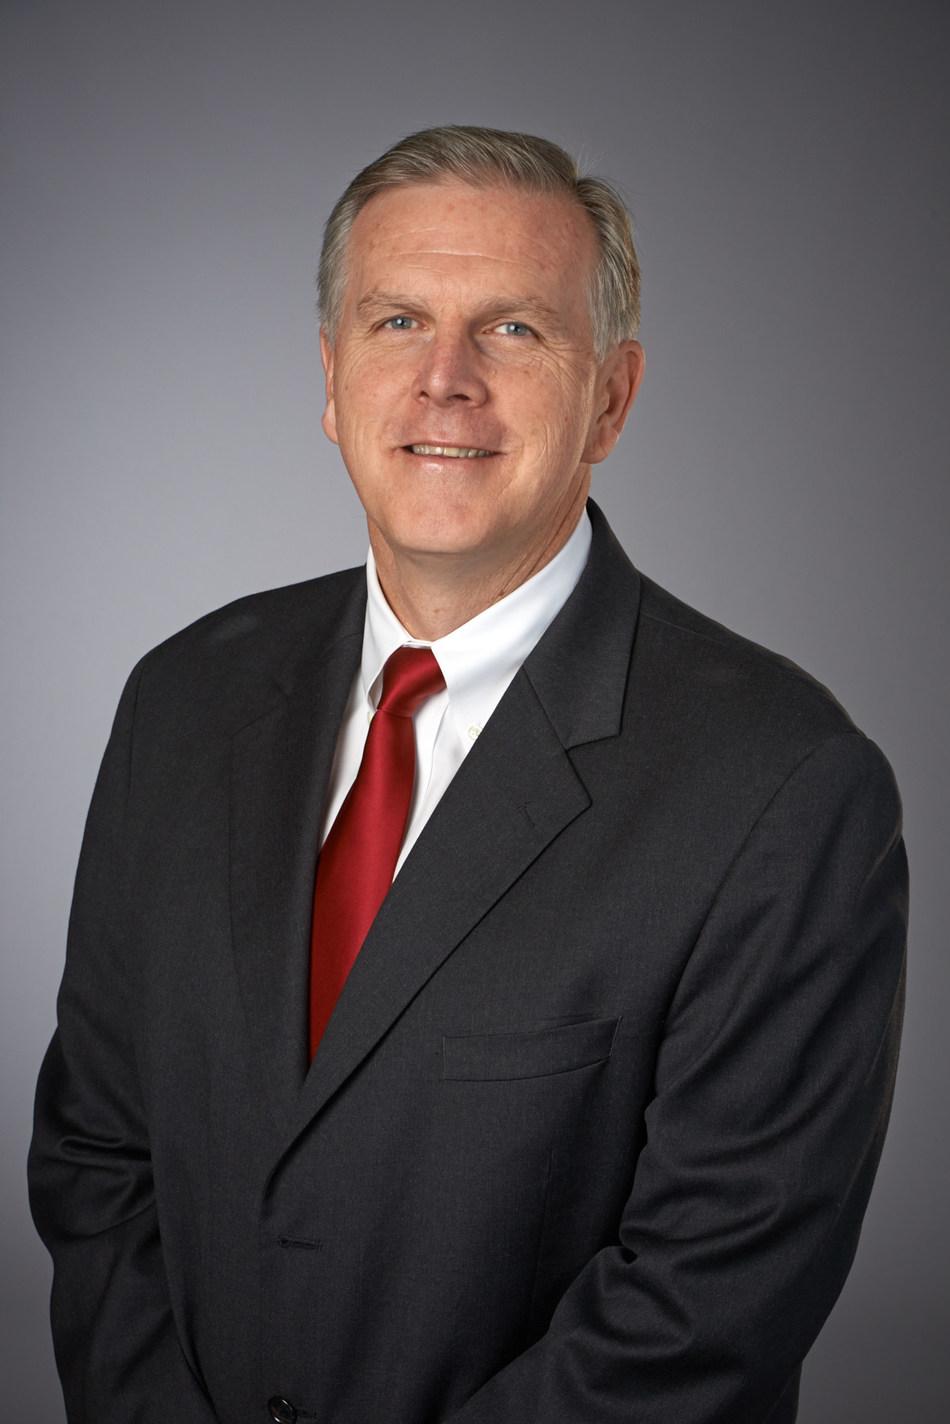 Kevin J. Wheeler A. O. Smith Corporation